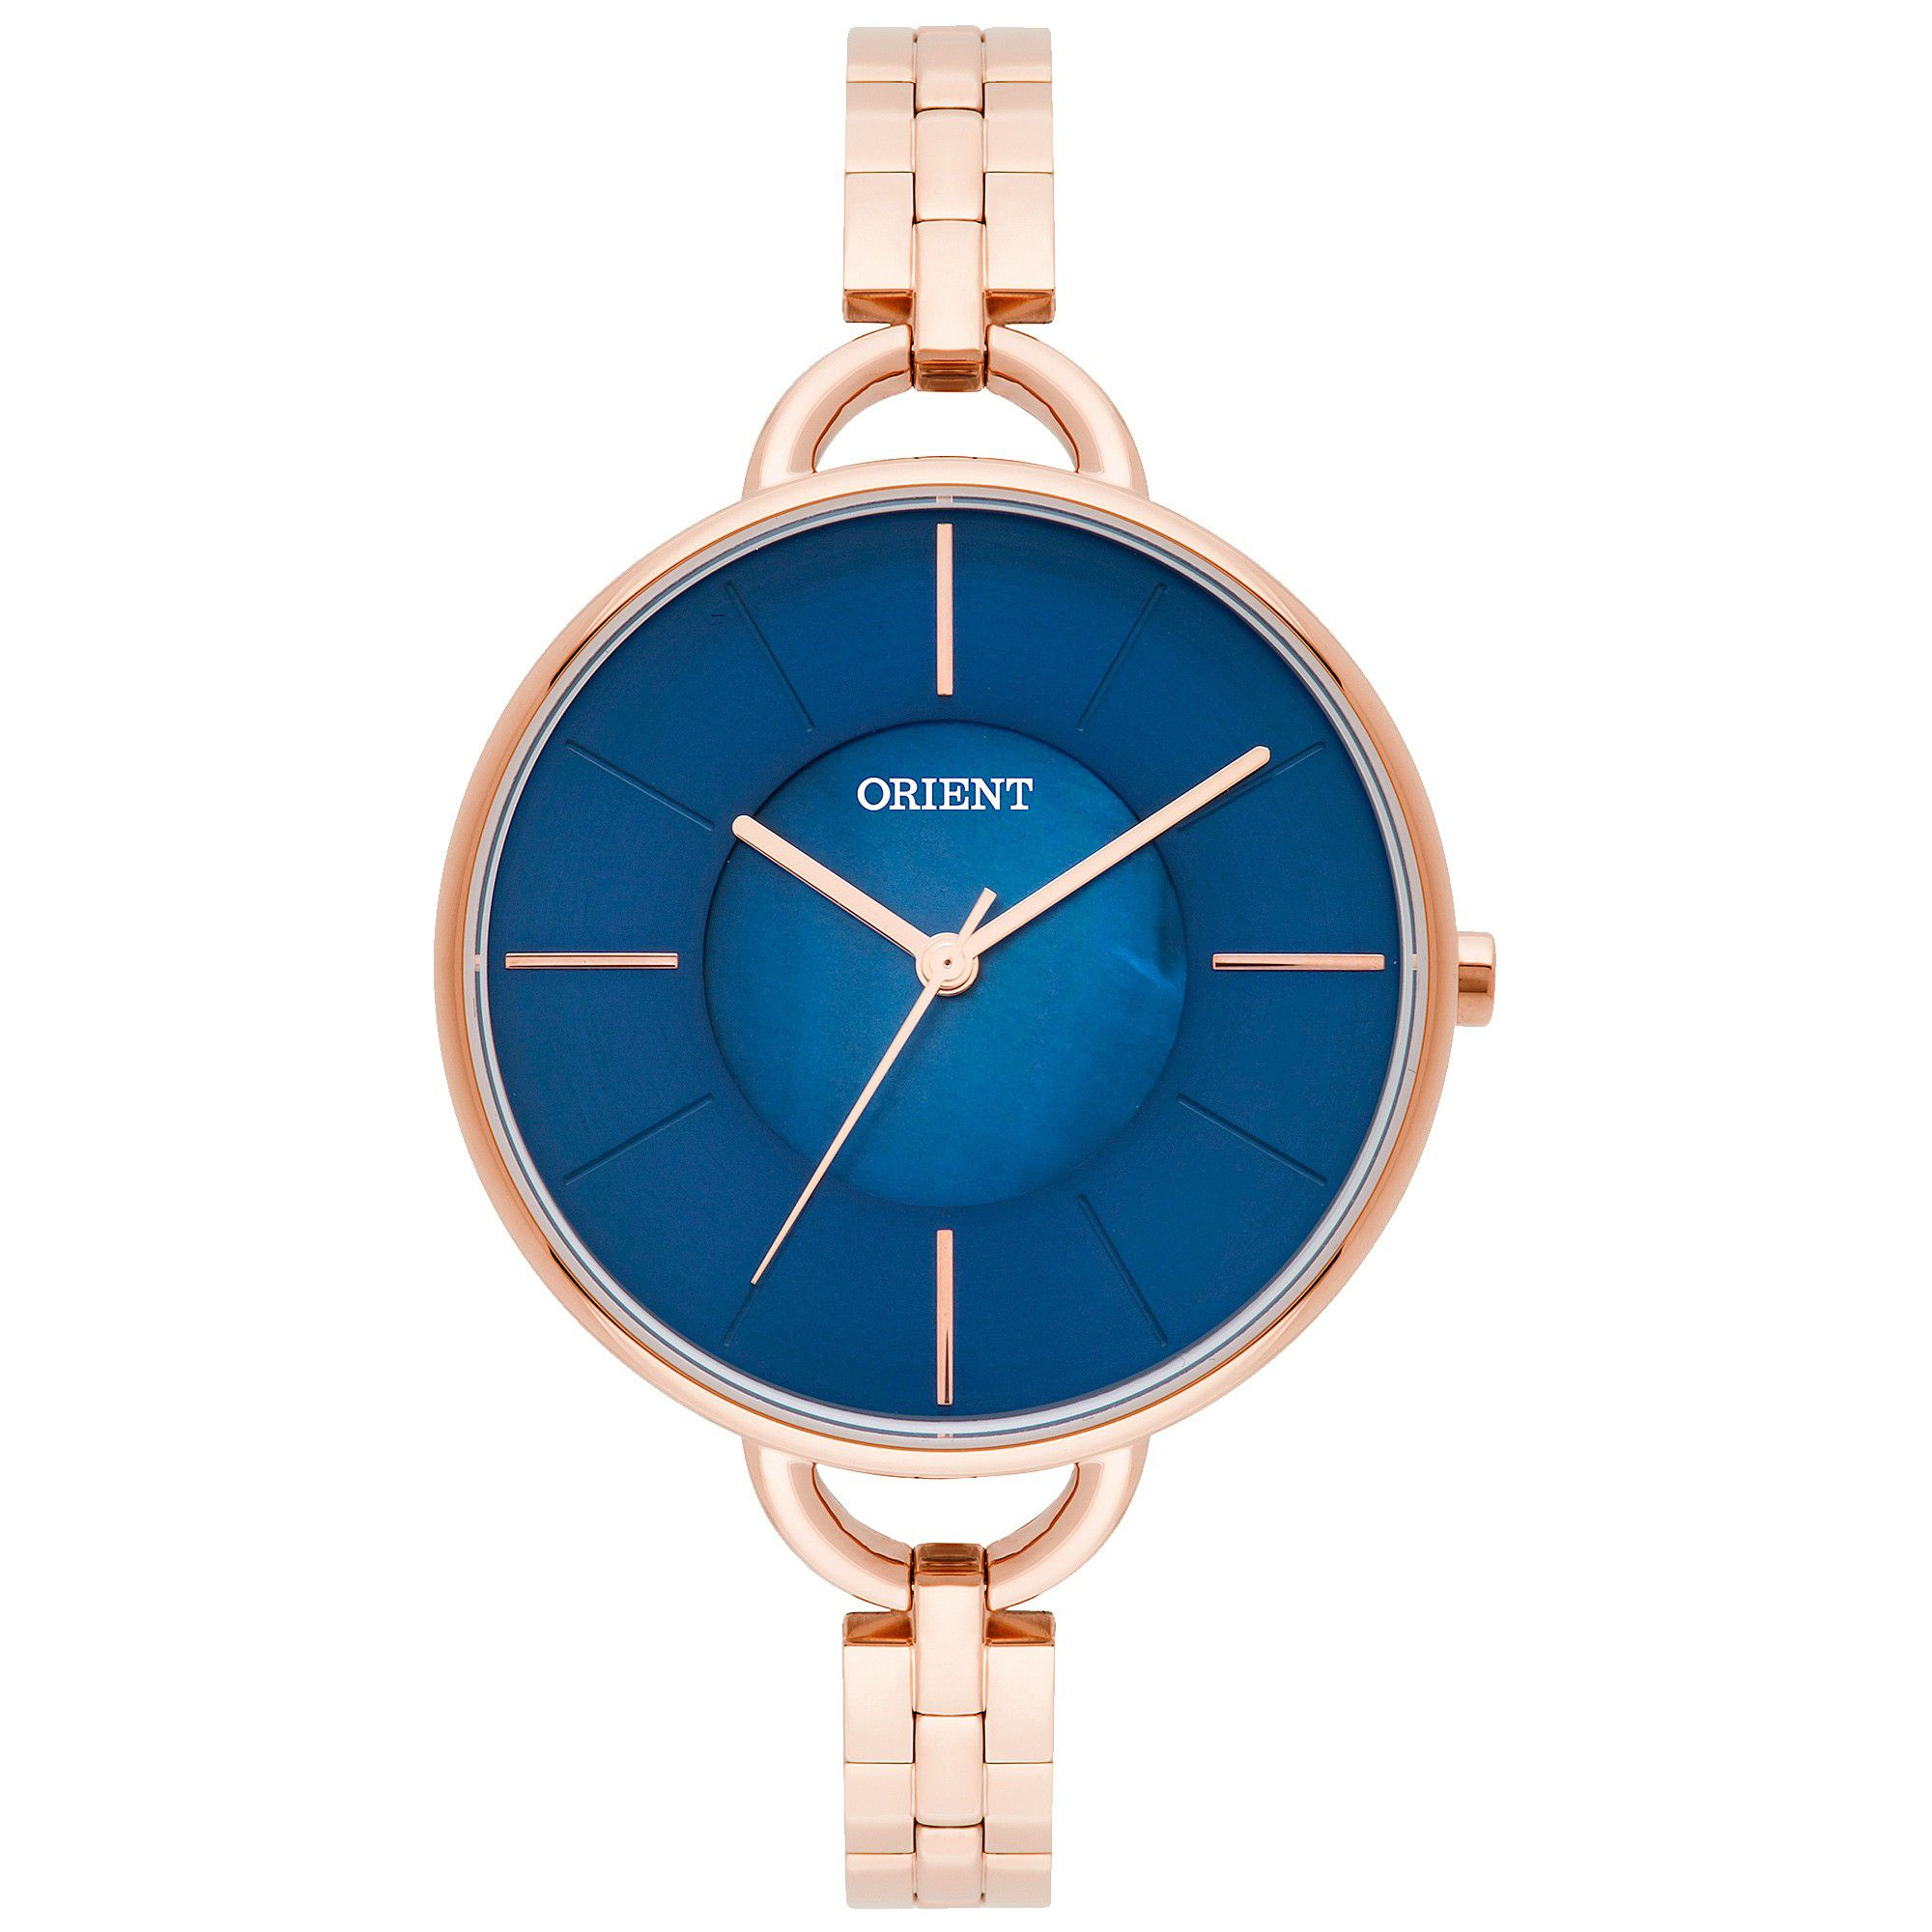 Relógio Feminino Orient FRSS0026 D1RX